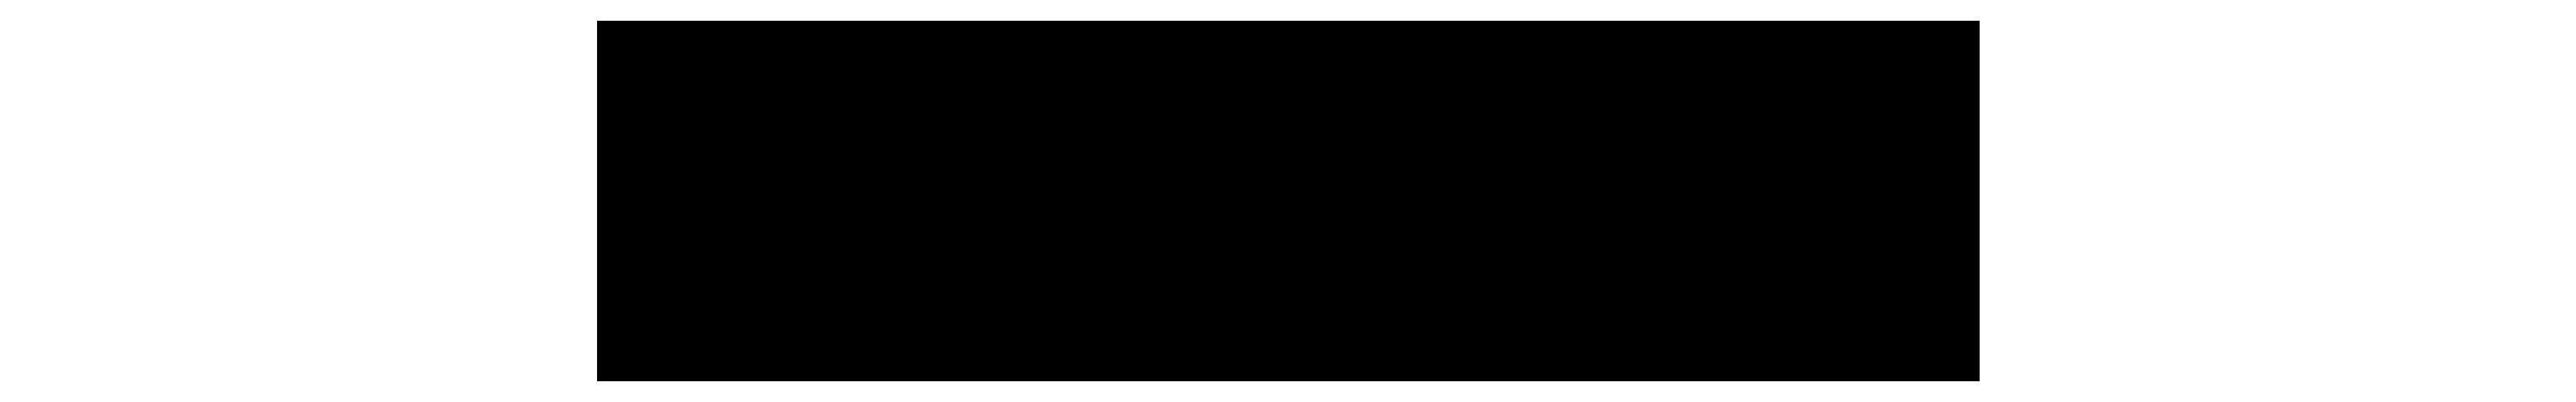 一加5 Android 8.0 rom ► Nitrogen OS ► 个性化设置 按键自定义